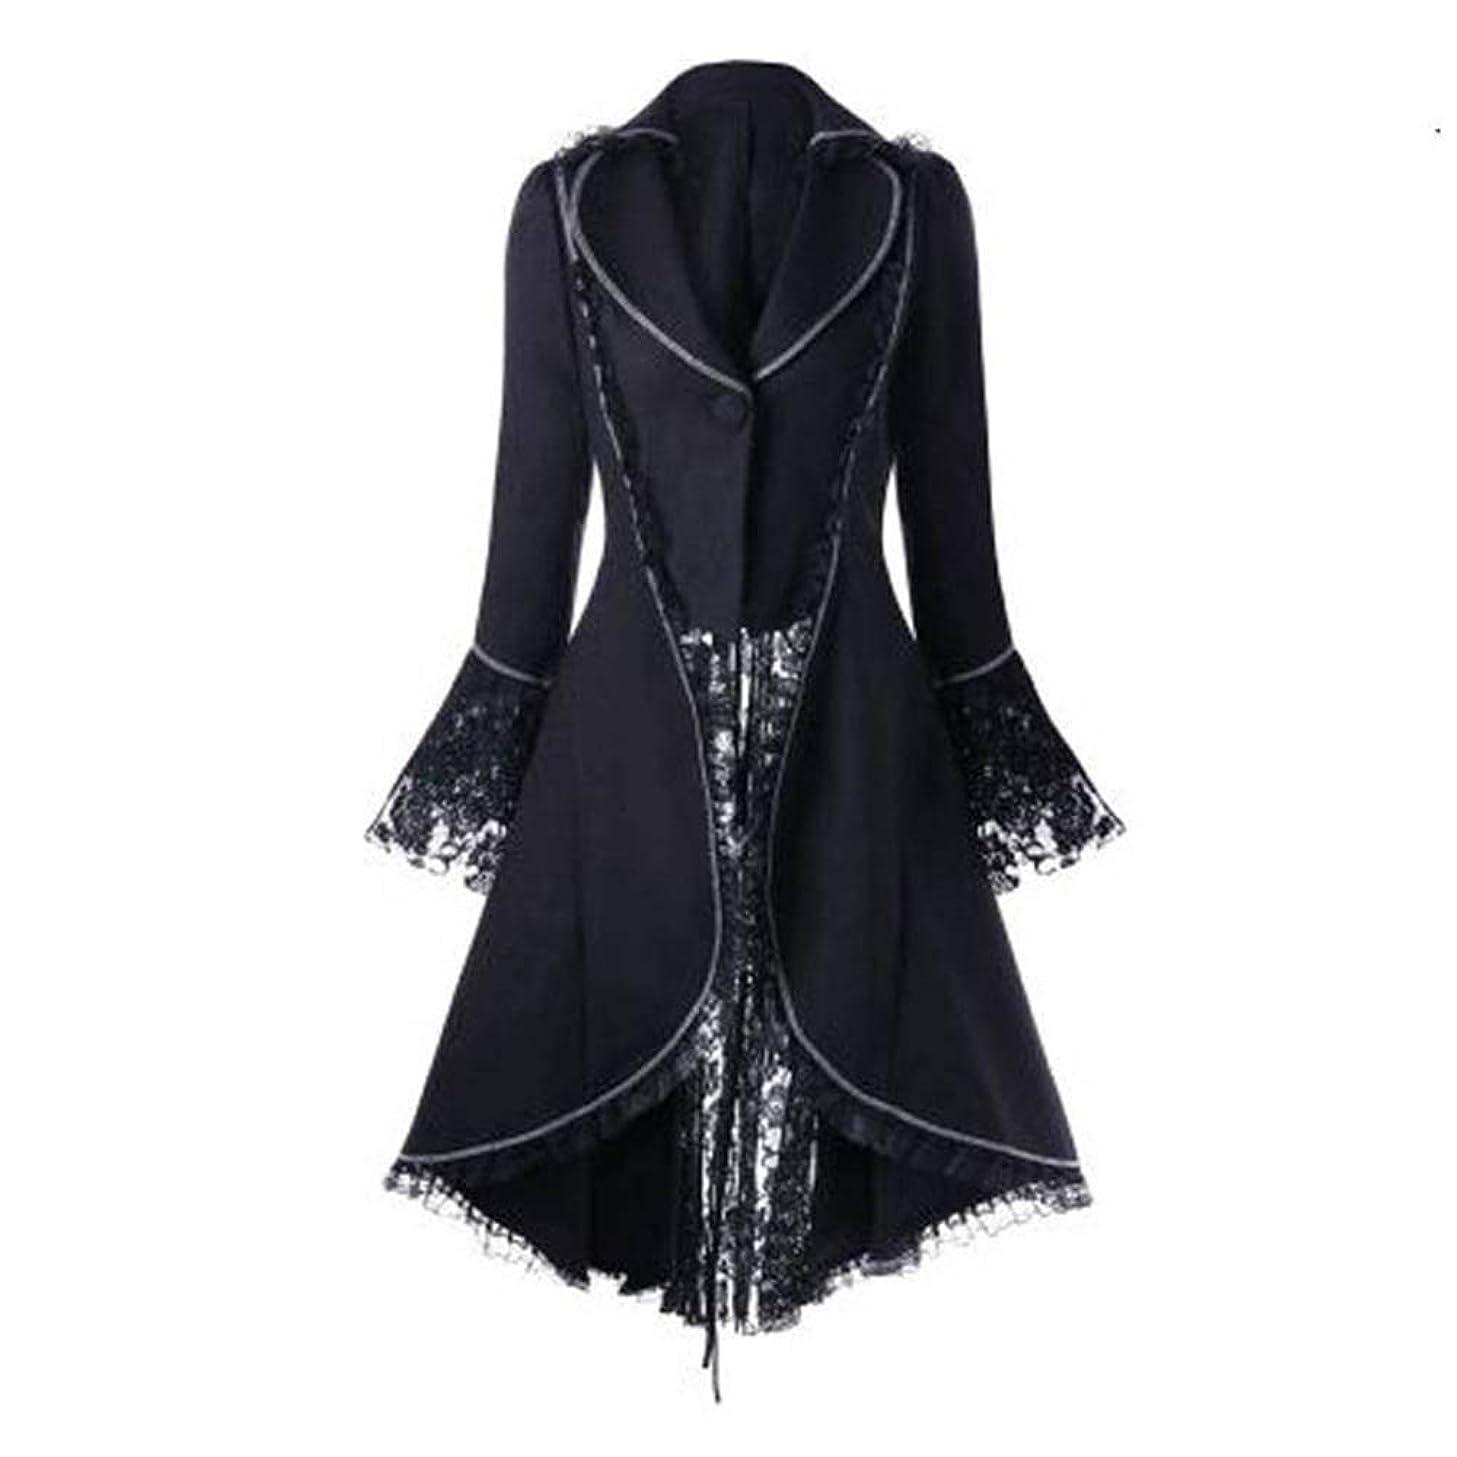 Toimoth Women's Tuxedo Gothic Tailcoat Jacket Steampunk VTG Victorian Coat Wedding Uniform